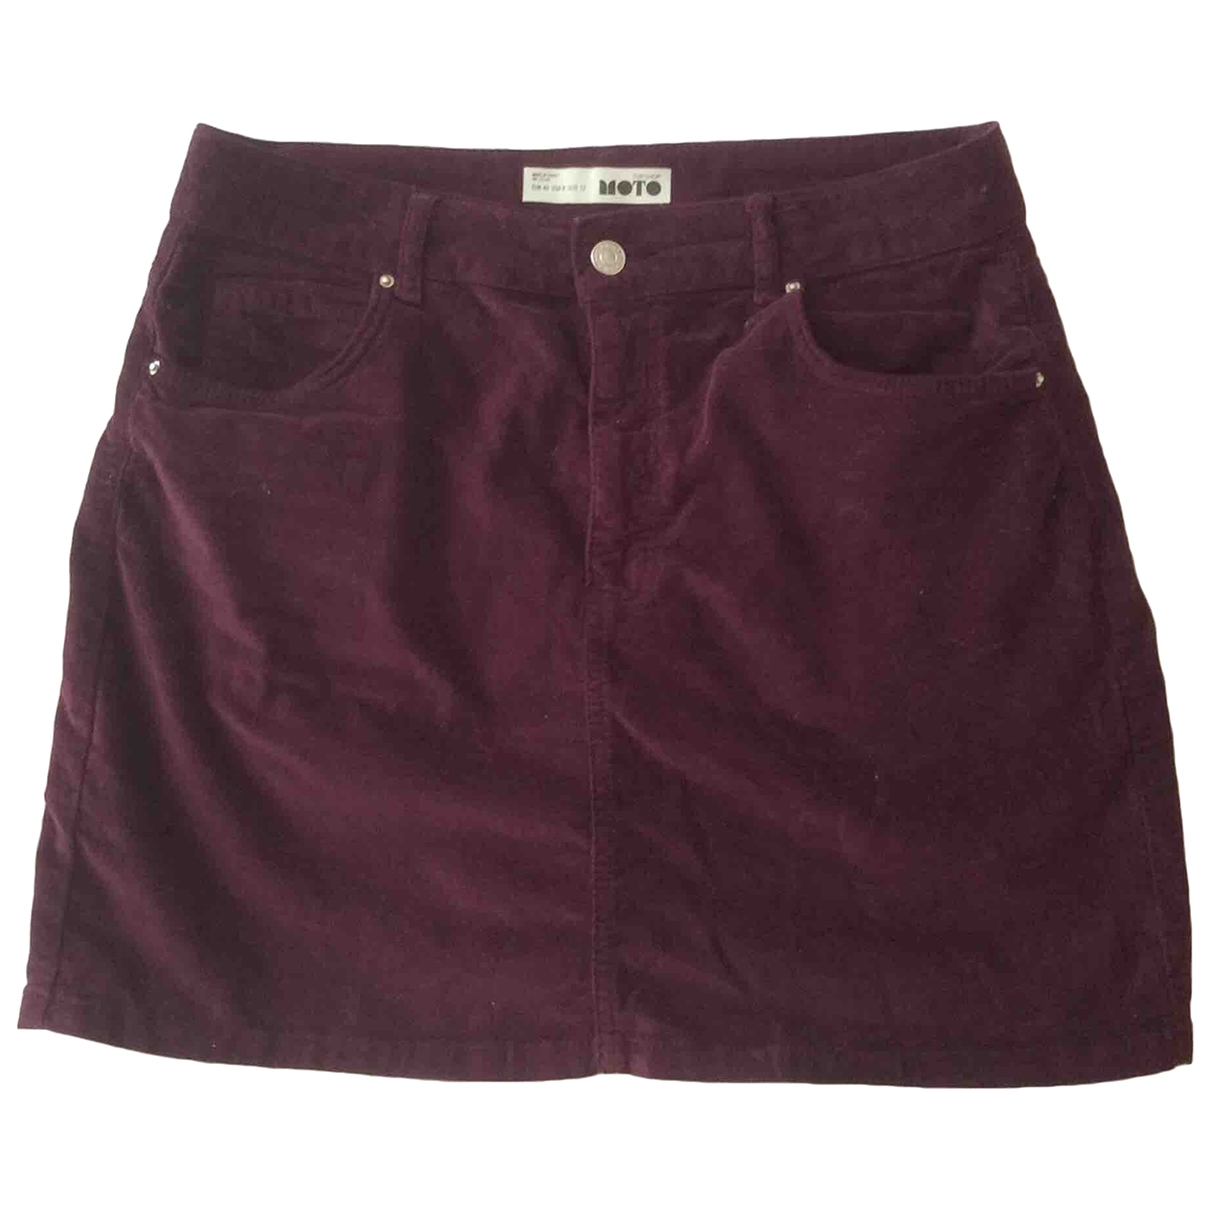 Mini falda de Terciopelo Topshop